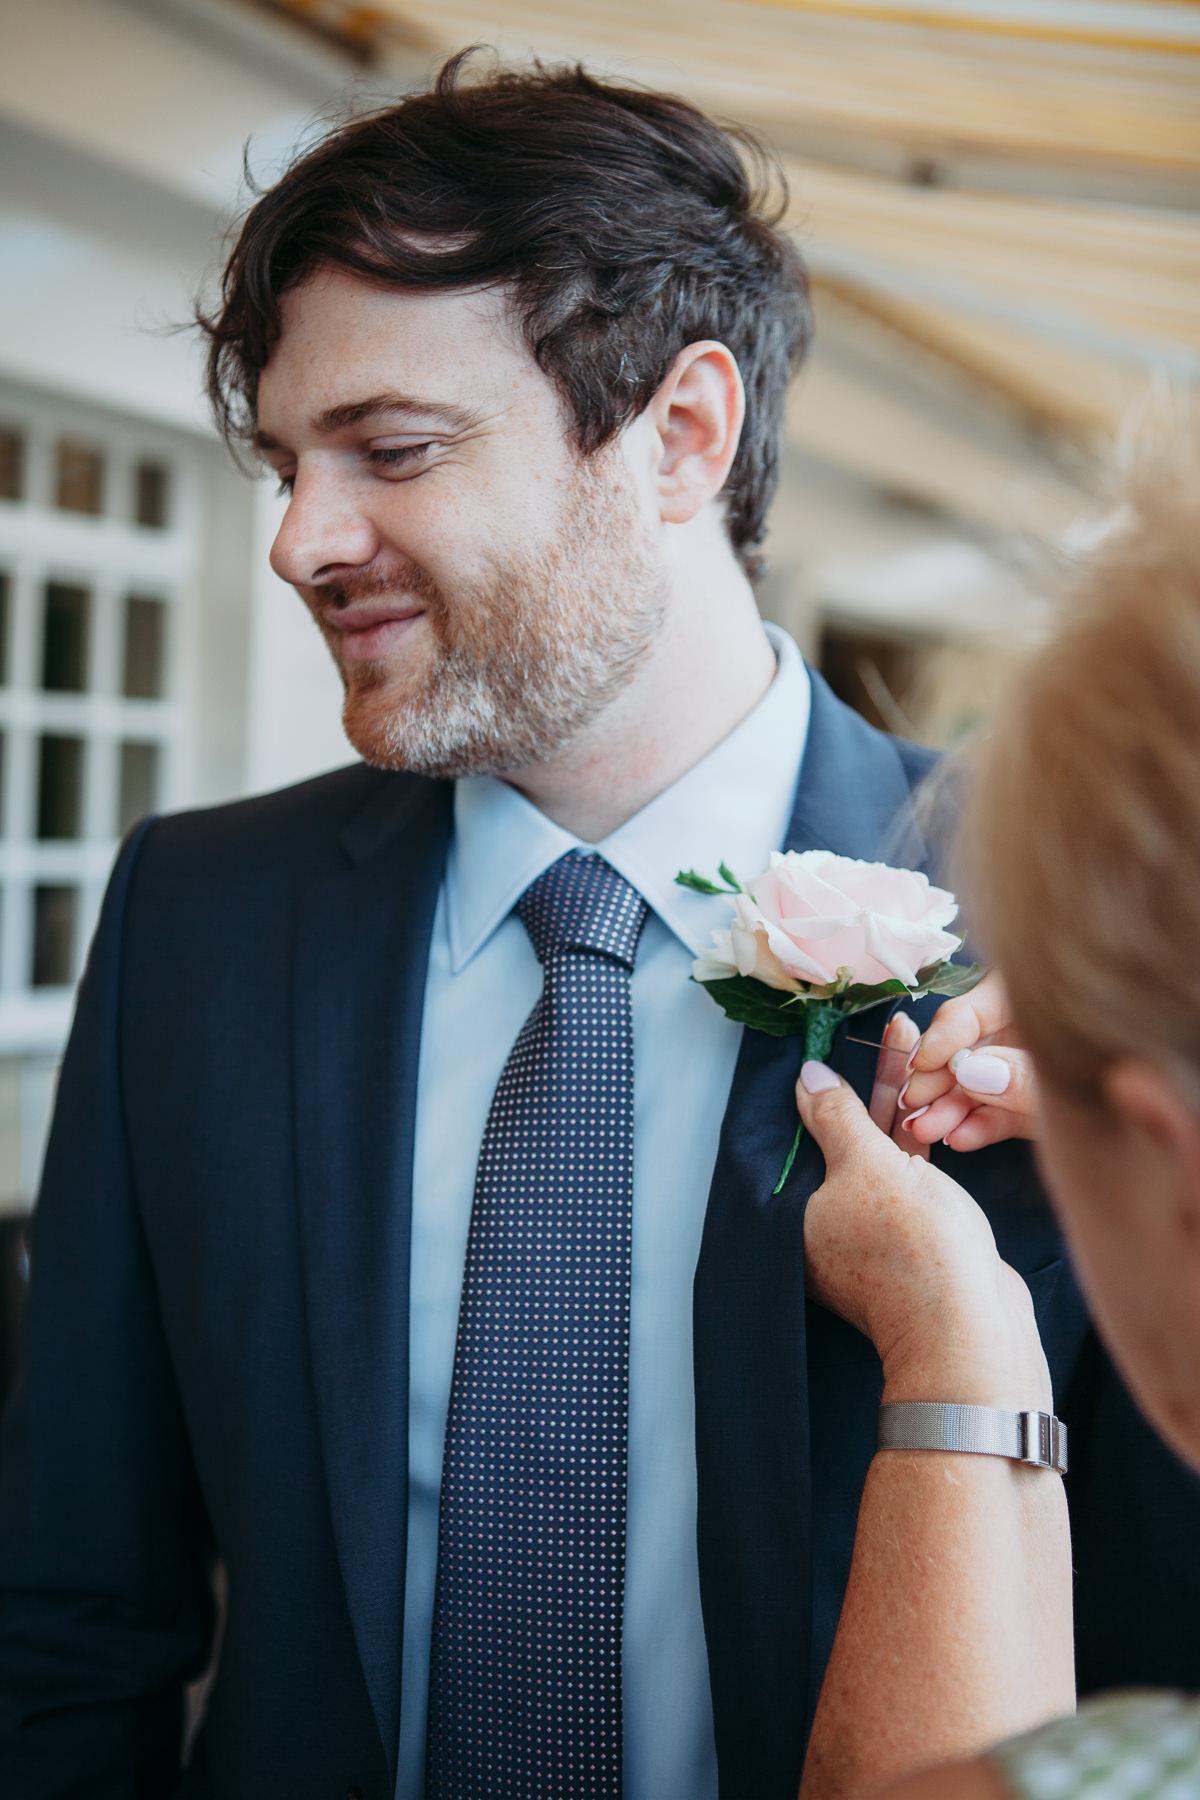 Fancy Hire Groom Suits Composition - Wedding Dress - googeb.com